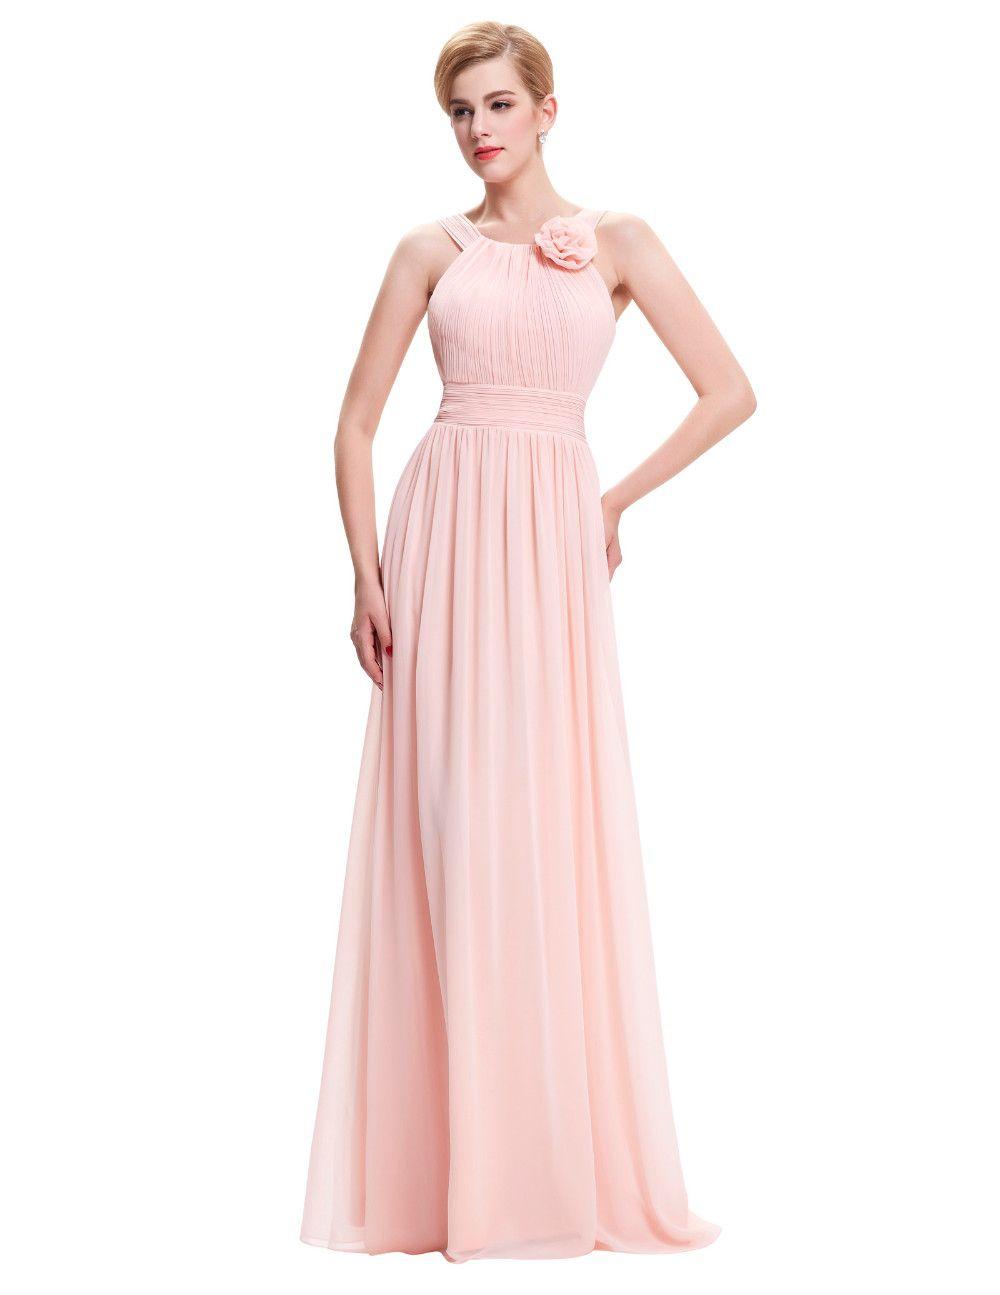 Elegant long chiffon pink bridesmaid dress beach bridesmaid